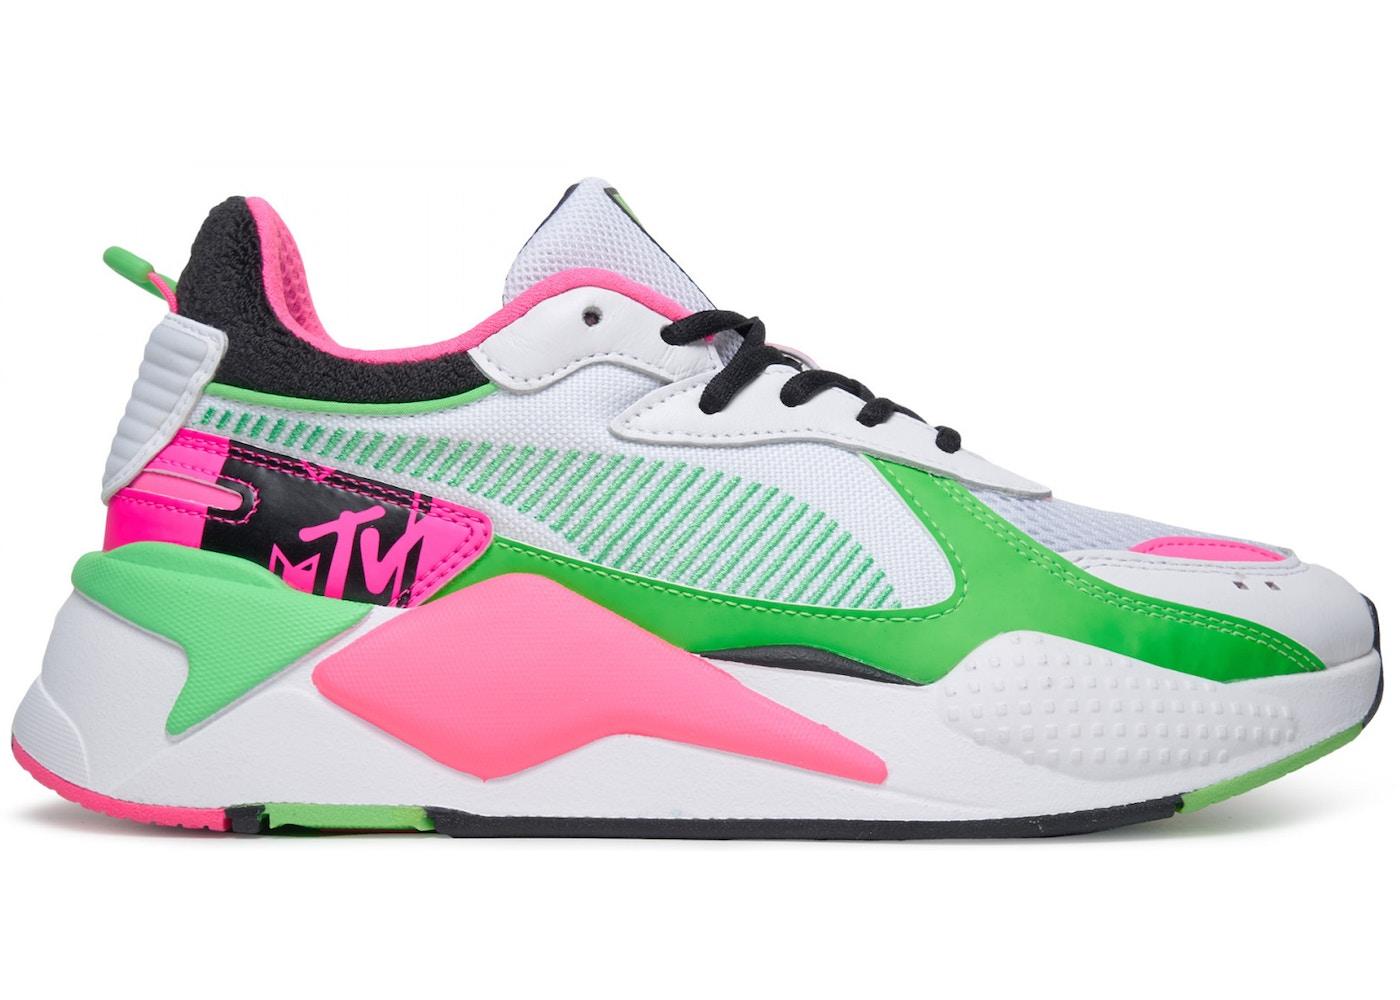 Size 14 Release Date Puma Shoes Bqrexewdoc KTF1lJc